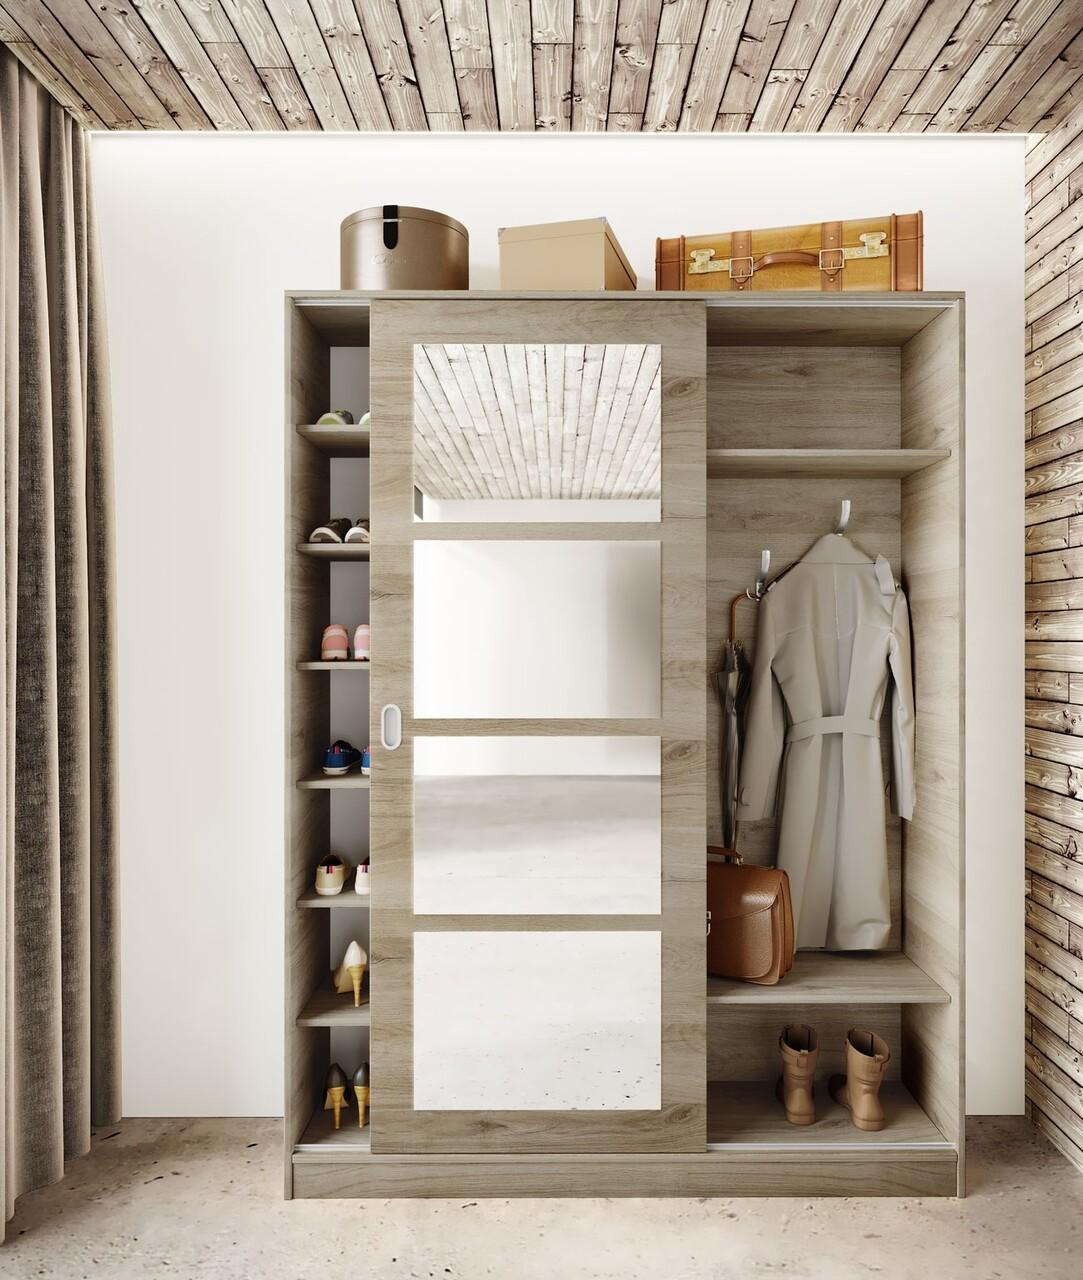 Dulap cu pantofar, cuier si oglinda, Bedora, City 4054, 150 x 38 x 201 cm, PAL, sonoma